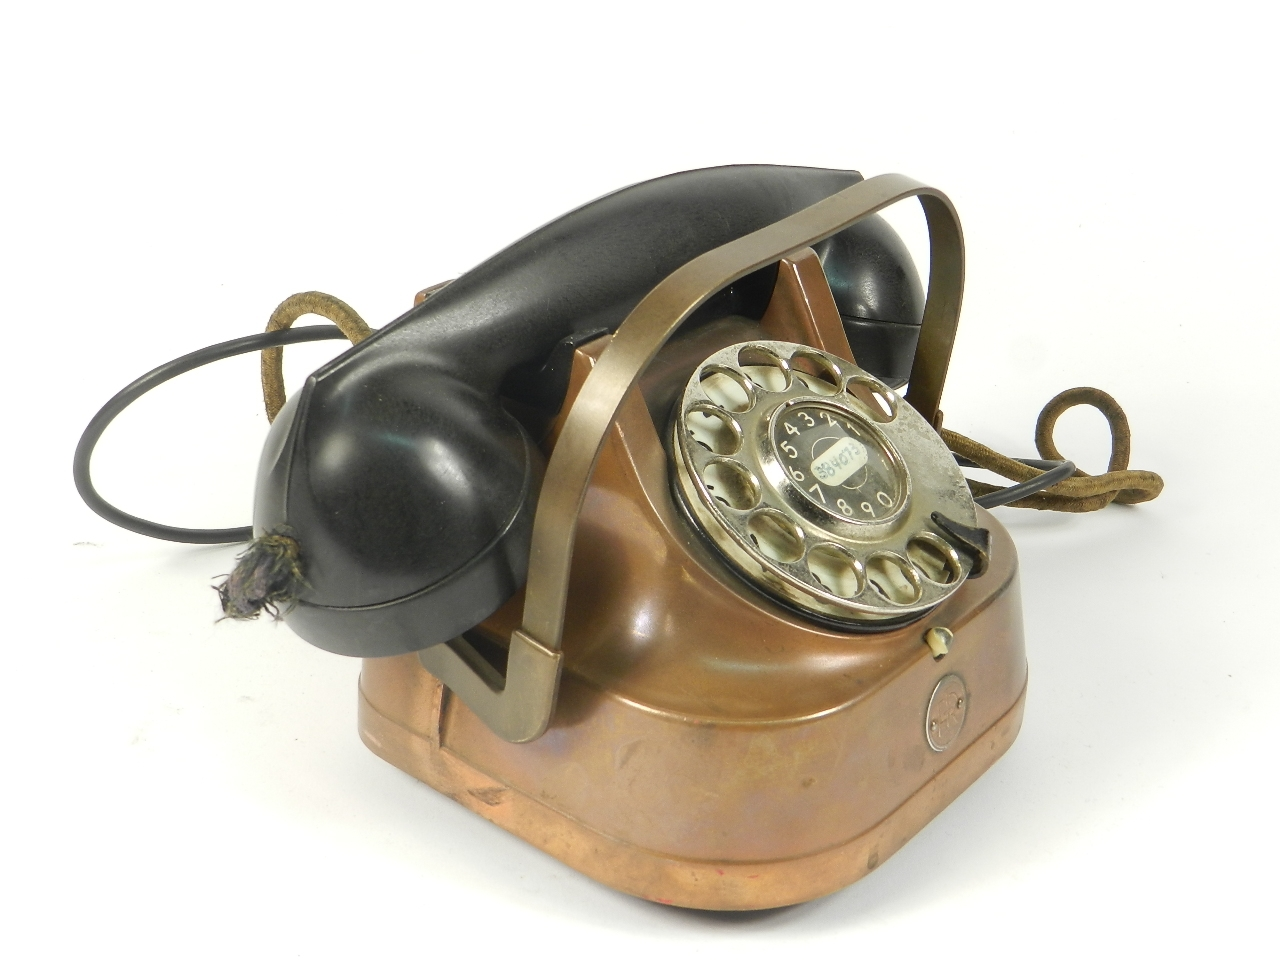 Imagen TELEFONO SOBREMESA COBRE AÑO 1940 35352